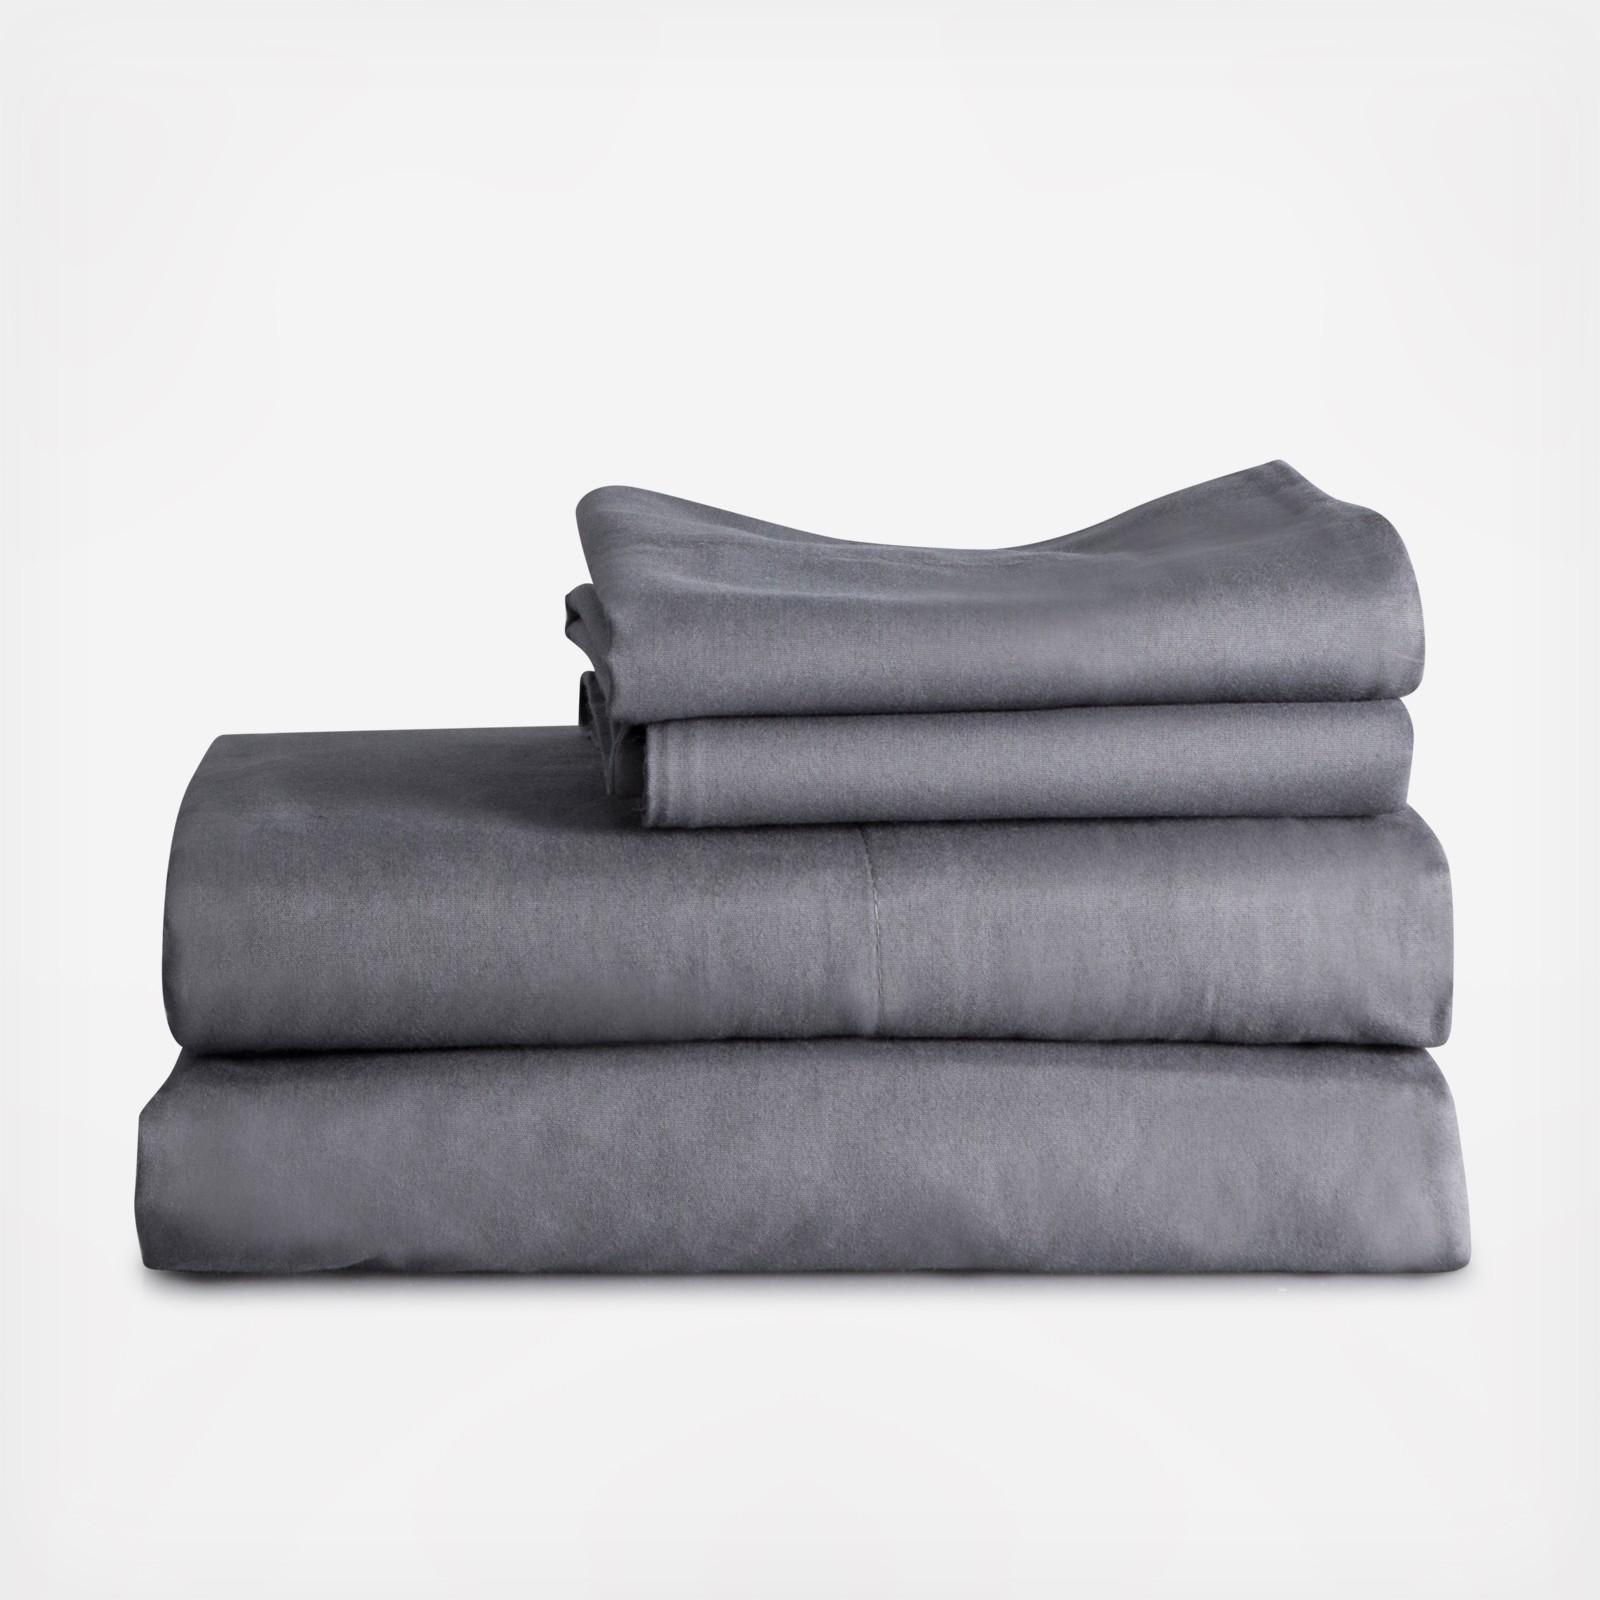 Amaze by welspun cotton sheet set bedding king navy blue - Amaze By Welspun Cotton Sheet Set Bedding King Navy Blue 20